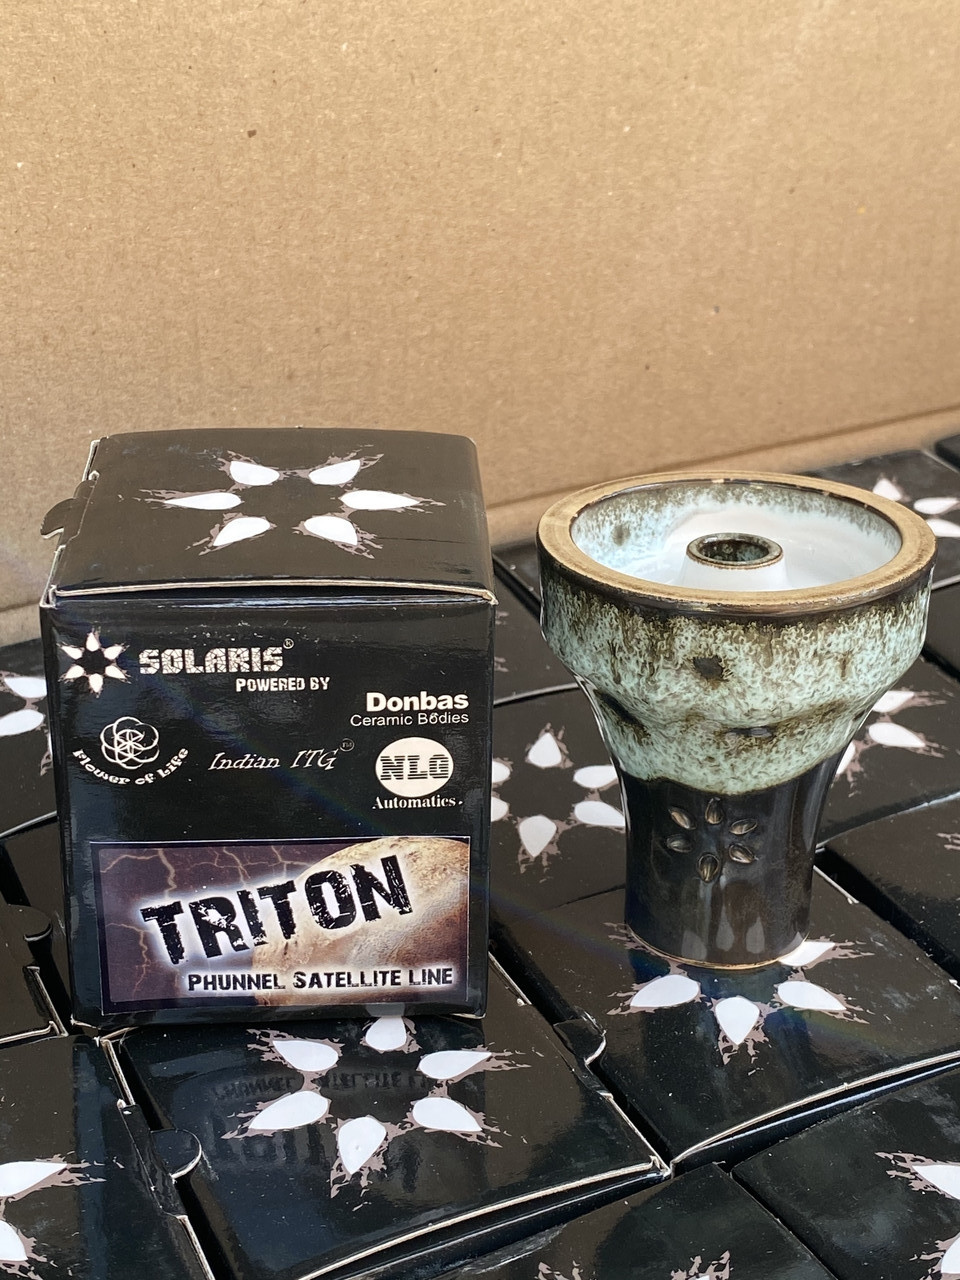 ЧАША ДЛЯ КАЛЬЯНА SOLARIS TRITON (СОЛЯРИС ТРИТОН - Глиняная чаша фаннел)